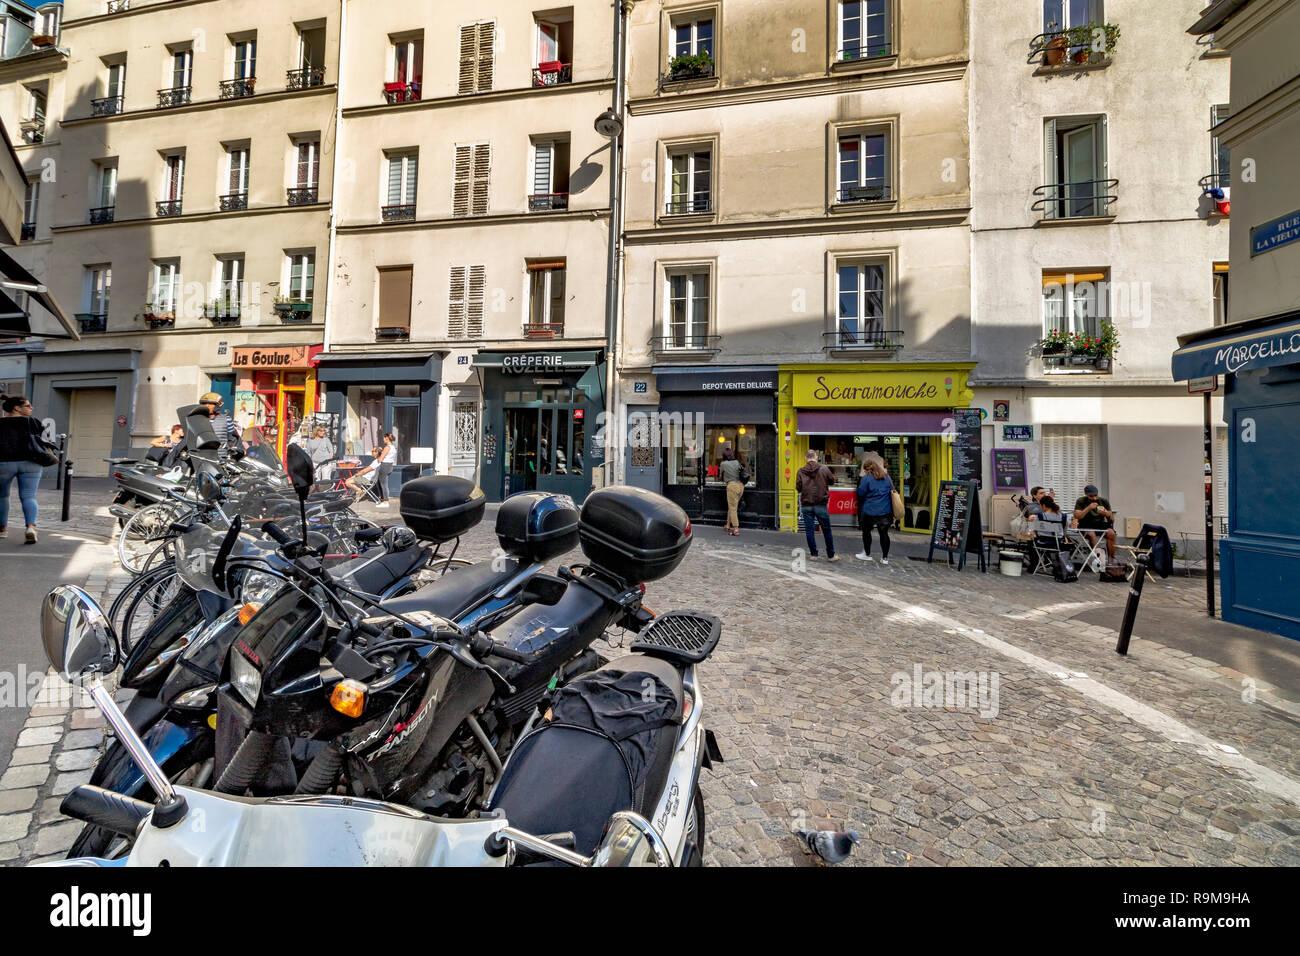 Motor Scooters / mopeds parked on Rue la Vieuville, Montmartre, Paris - Stock Image